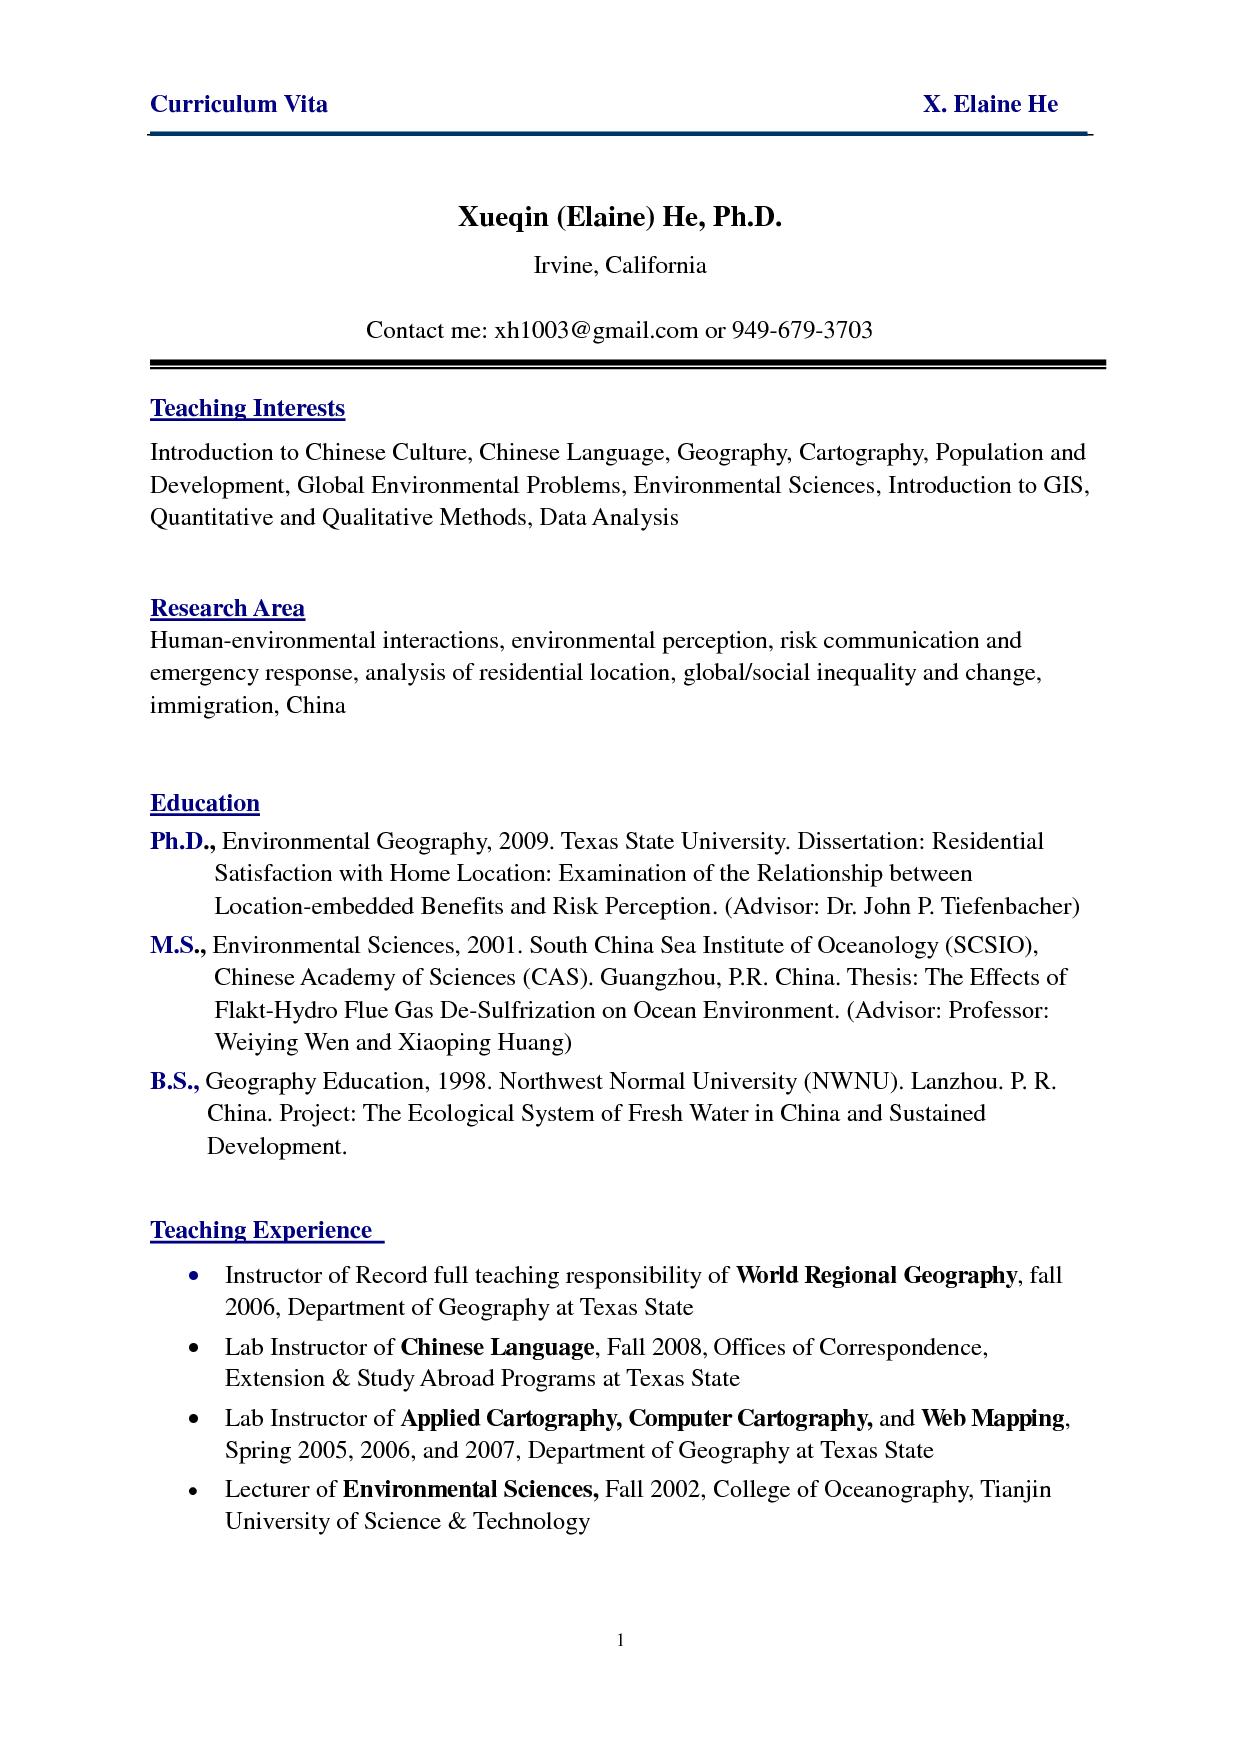 Free Resume Templates For Lpn Nurses Lpn Resume Rn Resume Template Rn Resume